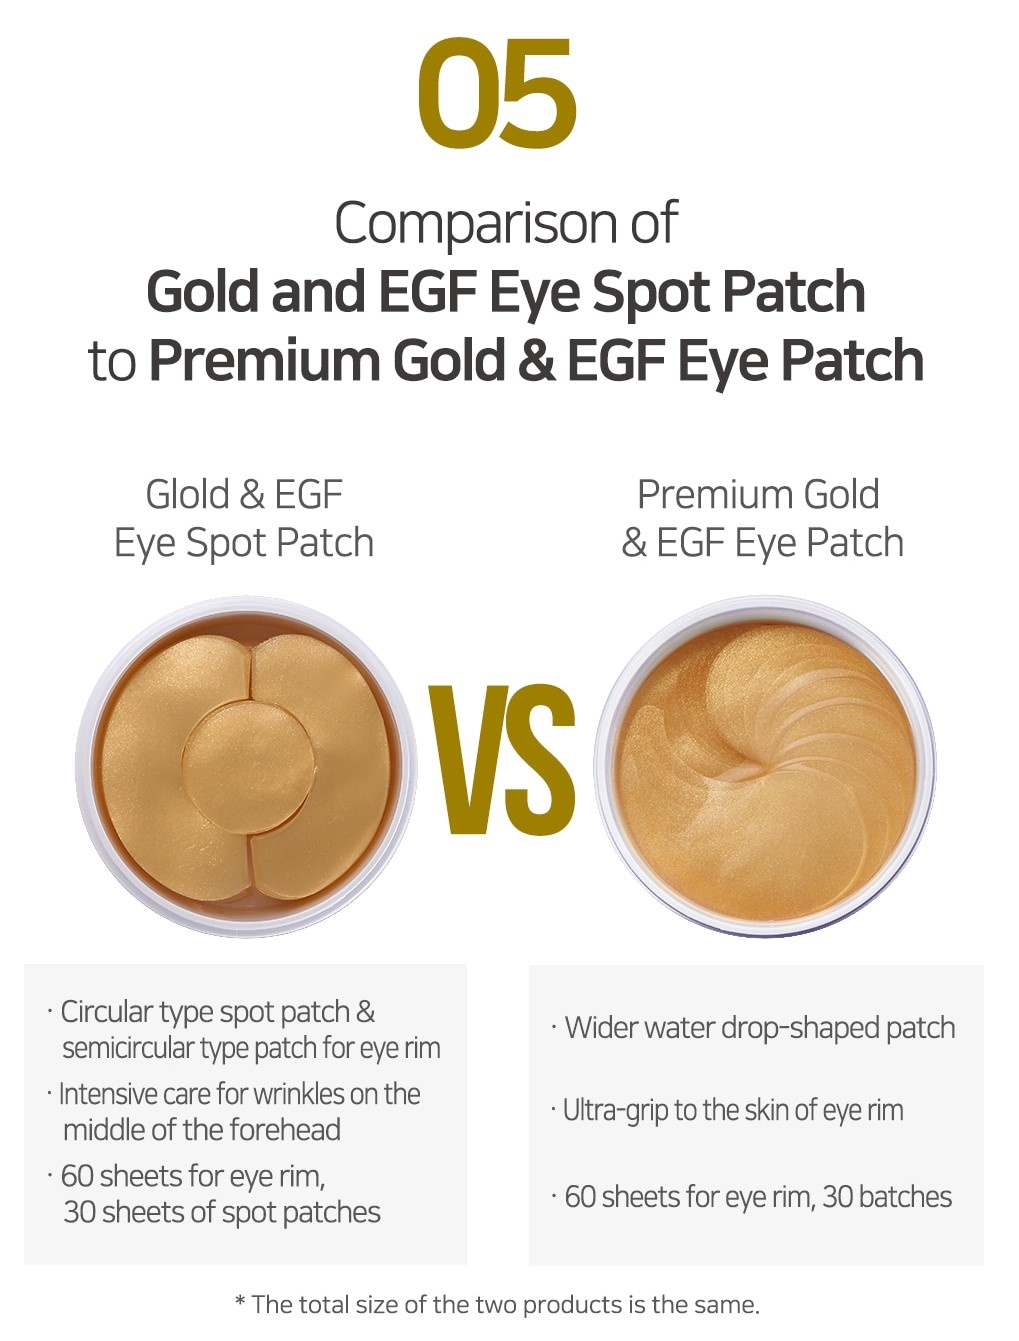 Premium Gold & EGF Eye Patch-7